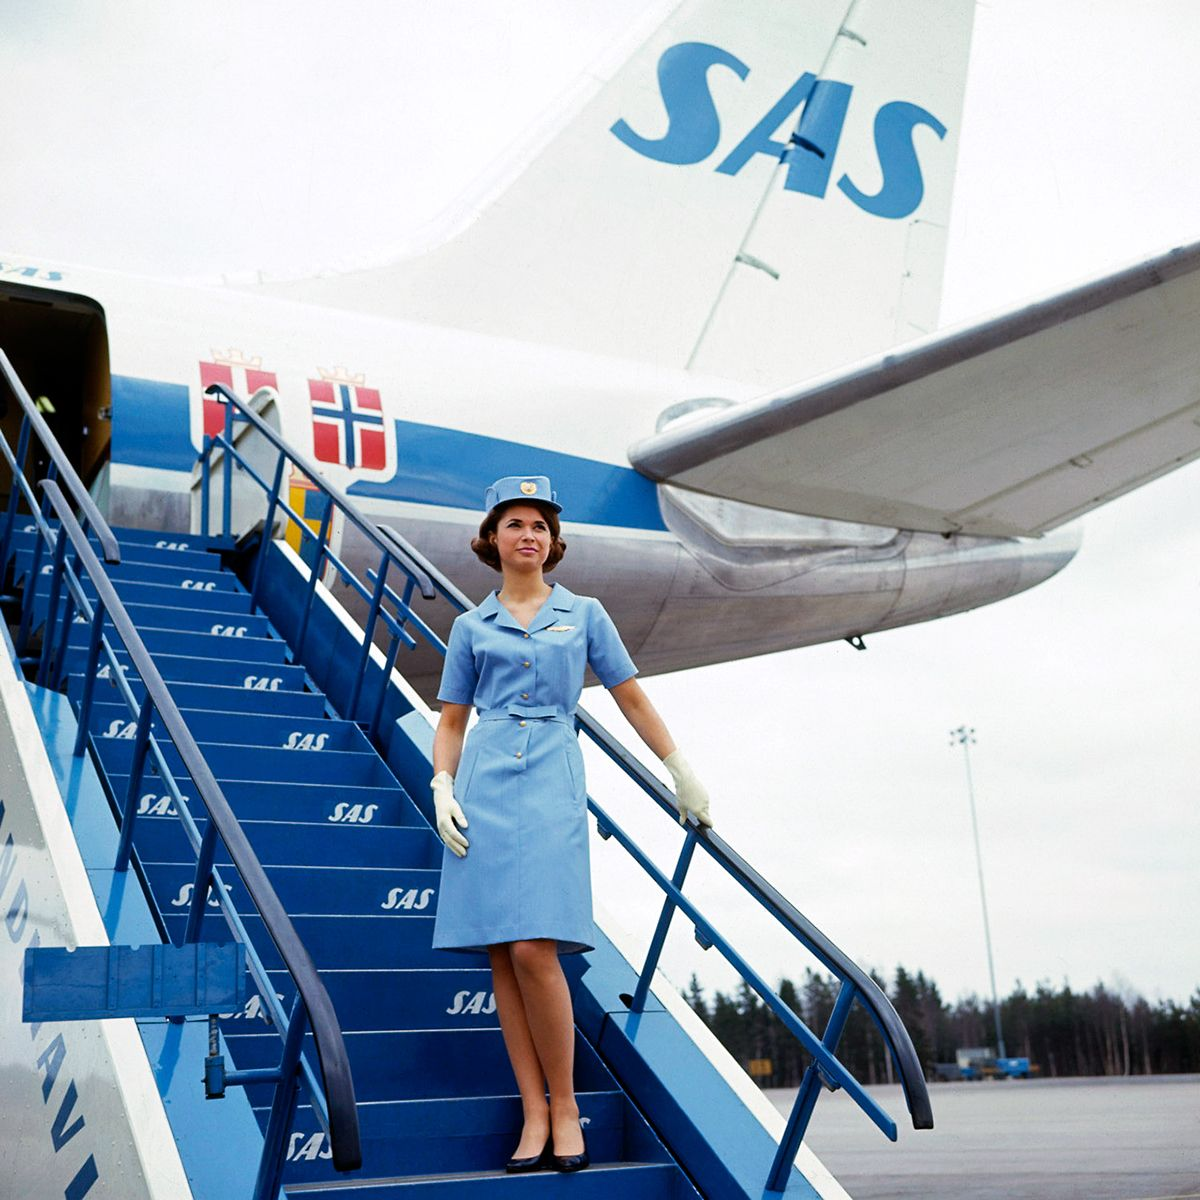 Flight Attendant For Scandinavian Airlines 1959 Belas Pernas Anuncios Antigos Aviacao